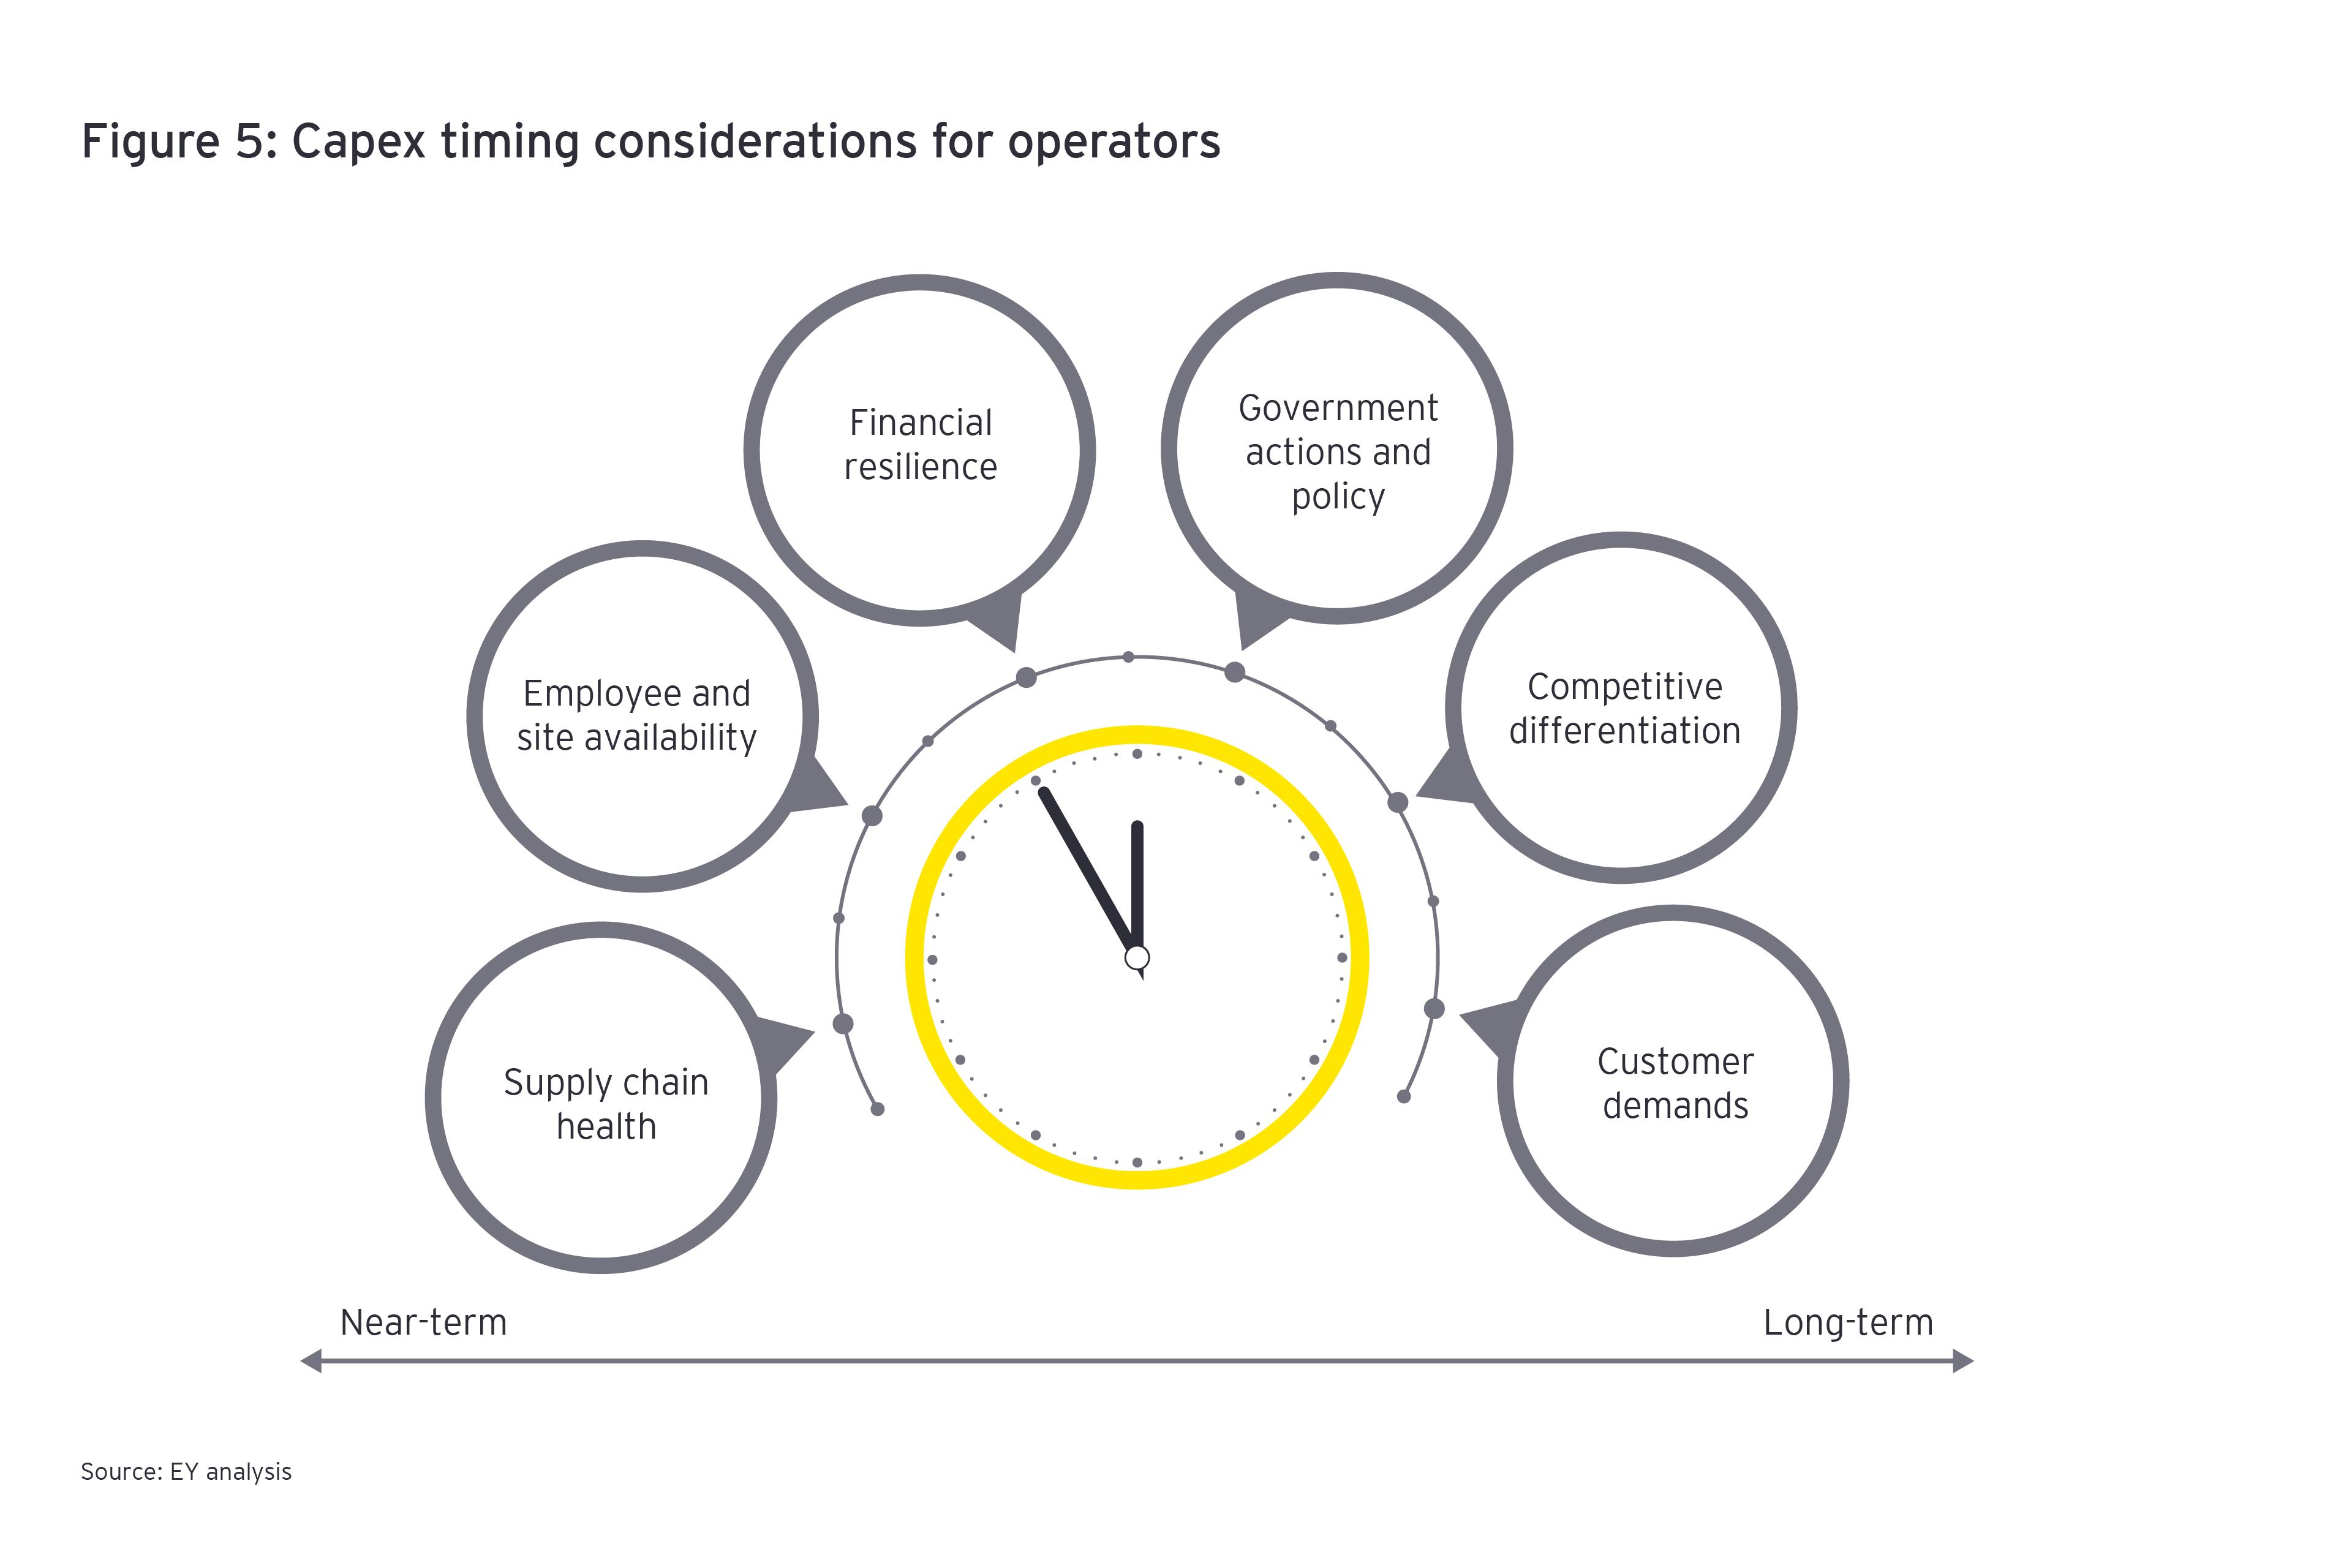 Capex timing considerations for operators